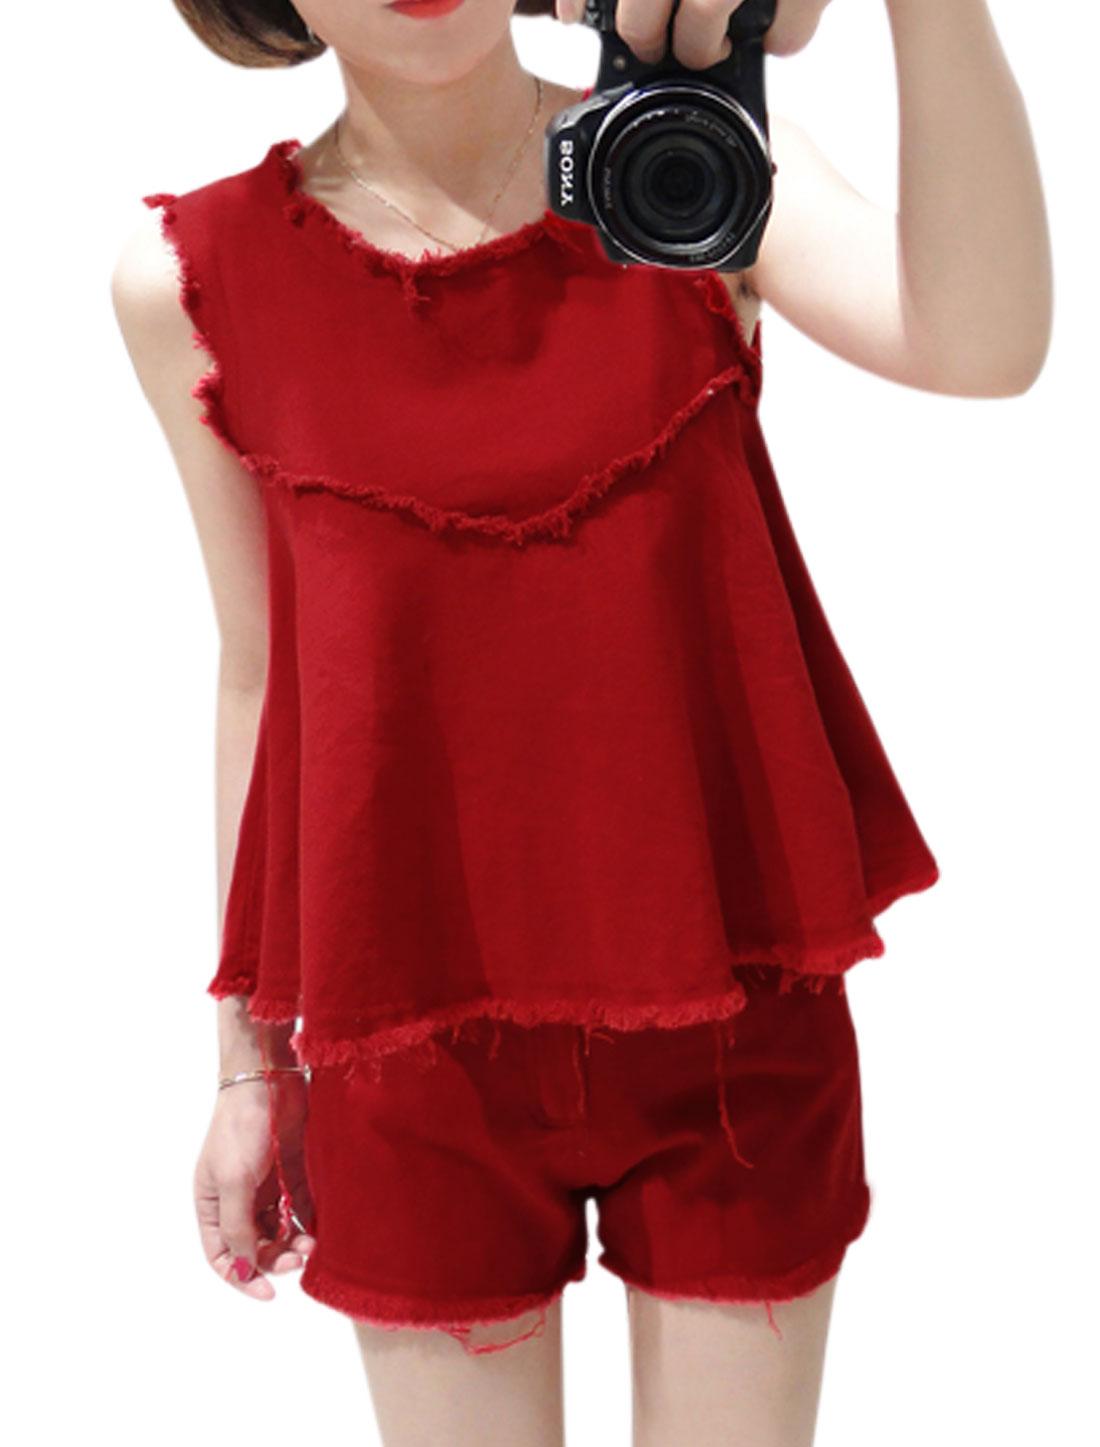 Ladies Sweet Tassel Detail Tank Top w Slant Pockets Shorts Red S